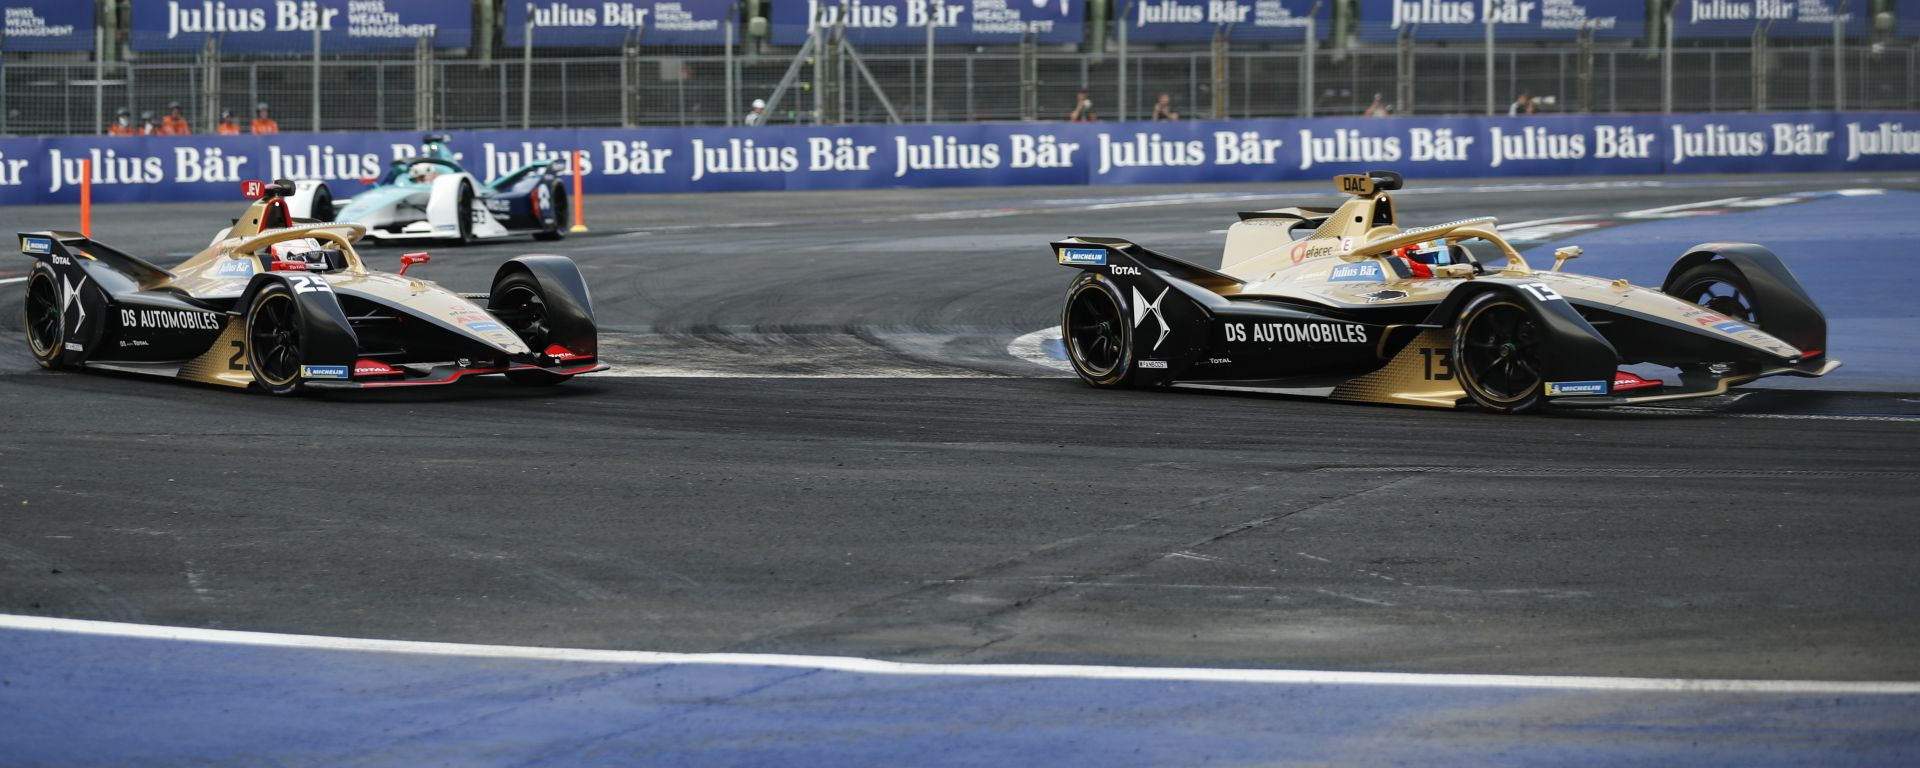 Formula E 2020, ePrix Città del Messico: i due piloti DS Techeetah, Vergne e Da Costa